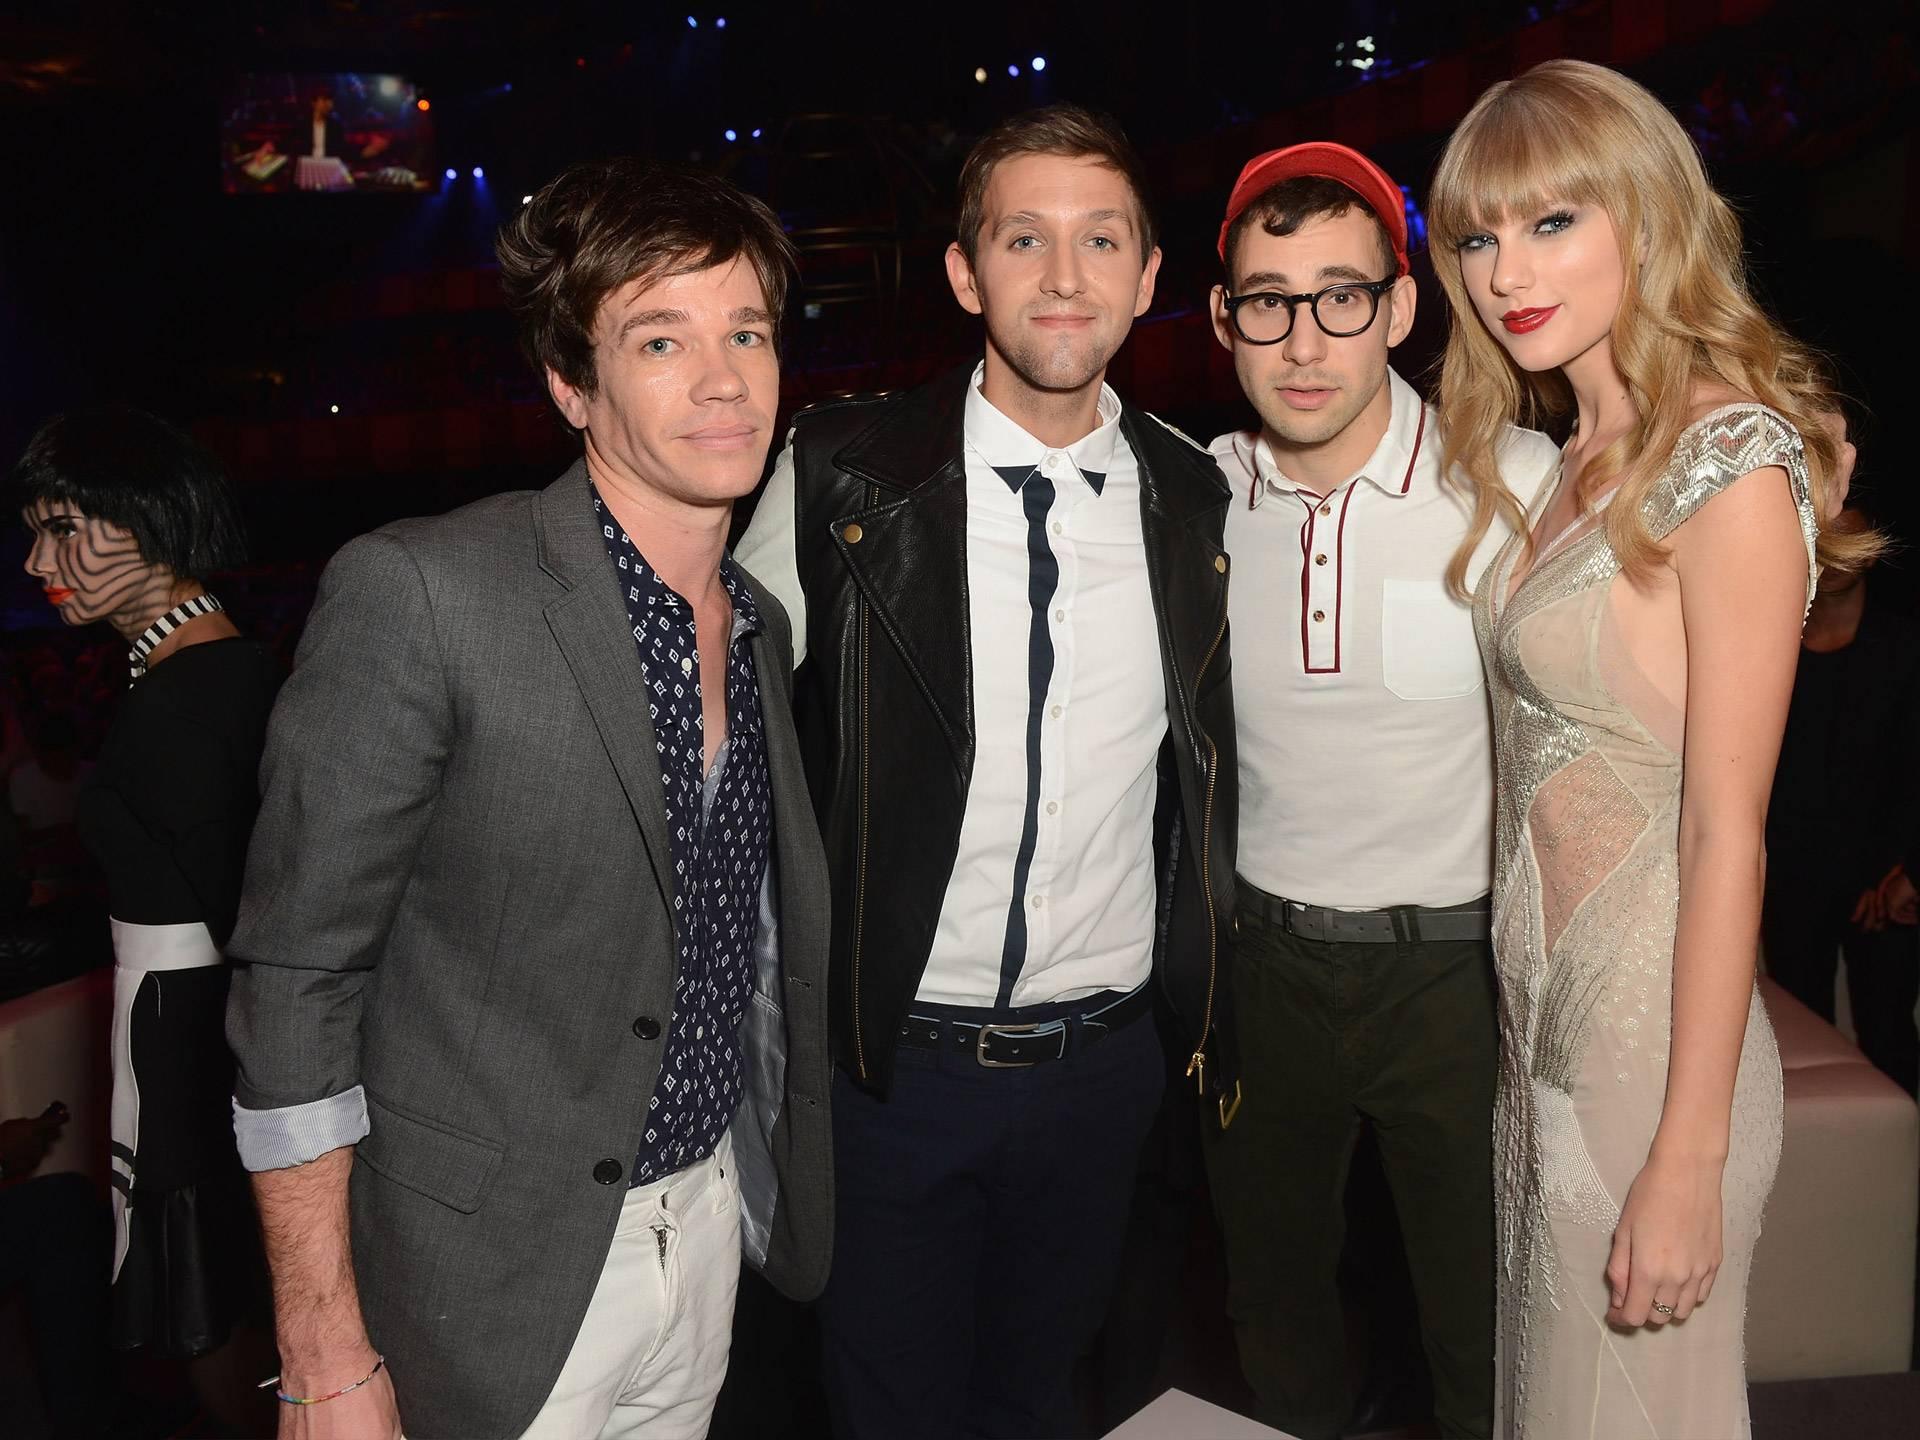 mgid:file:gsp:scenic:/international/mtvla.com/Taylor-Swift_Fun_Getty-Images-for-MTV_156042043.jpg